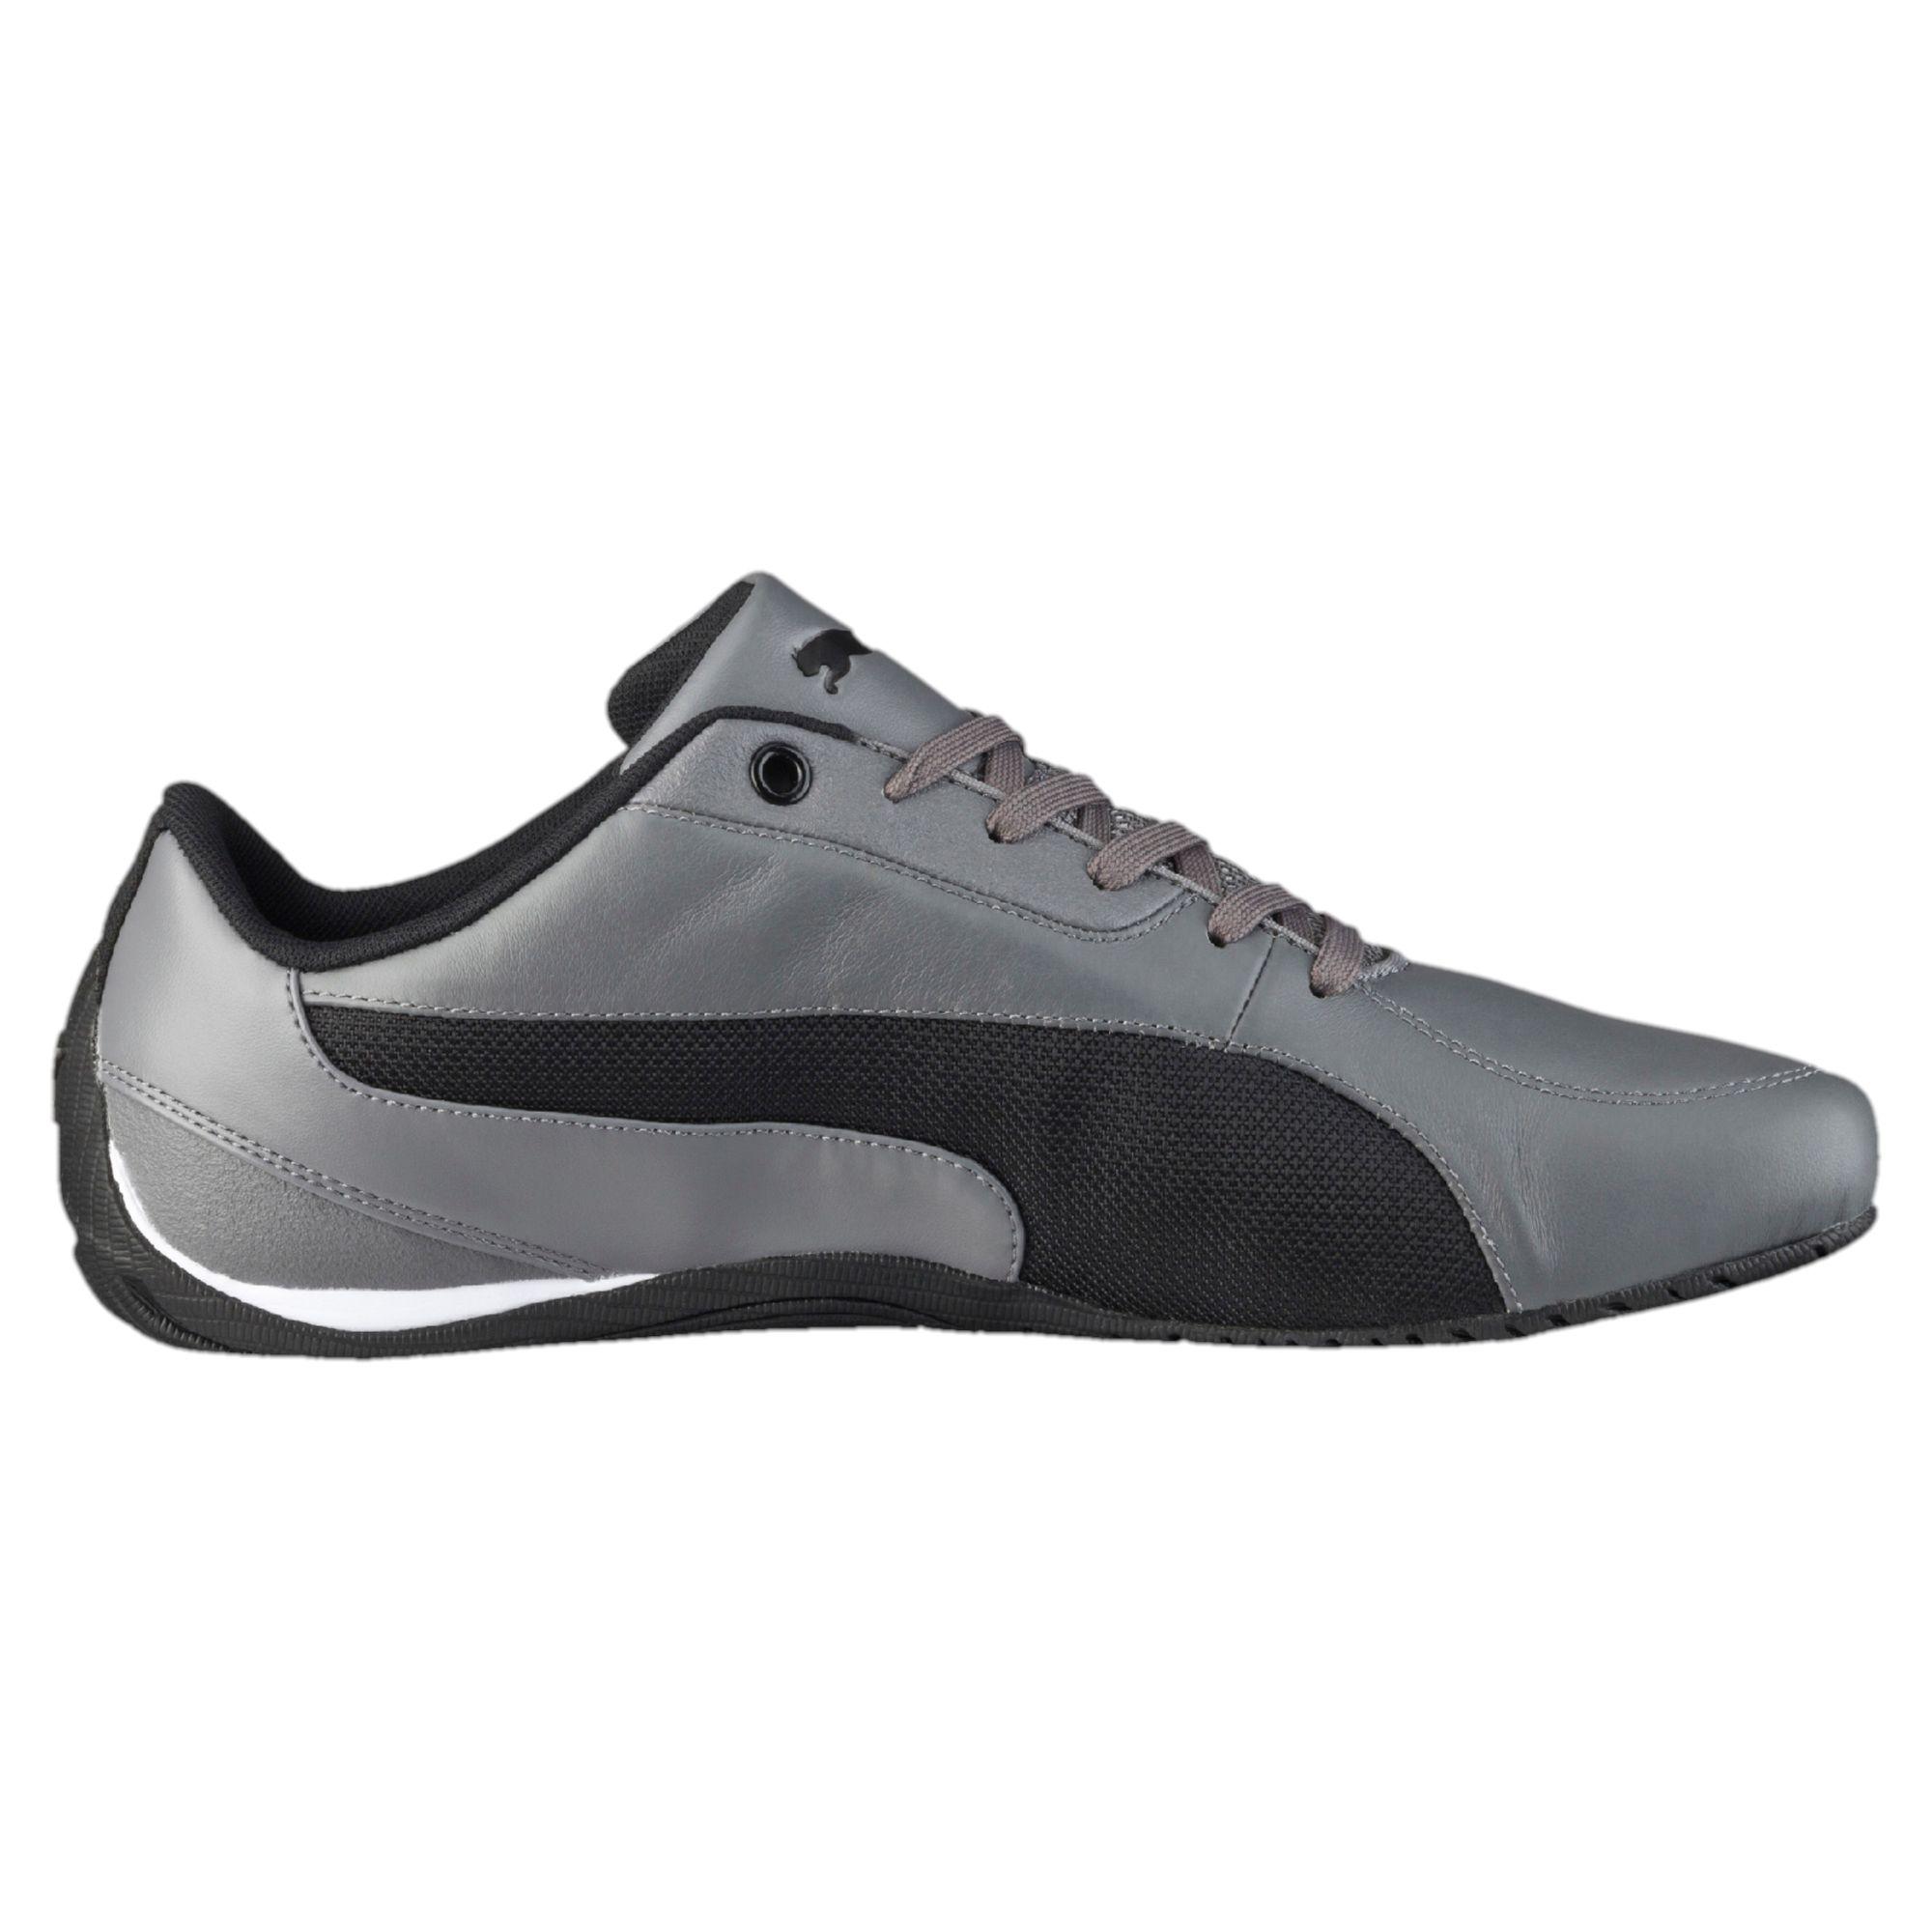 Puma Drift Cat 5 Leather Men' Shoes